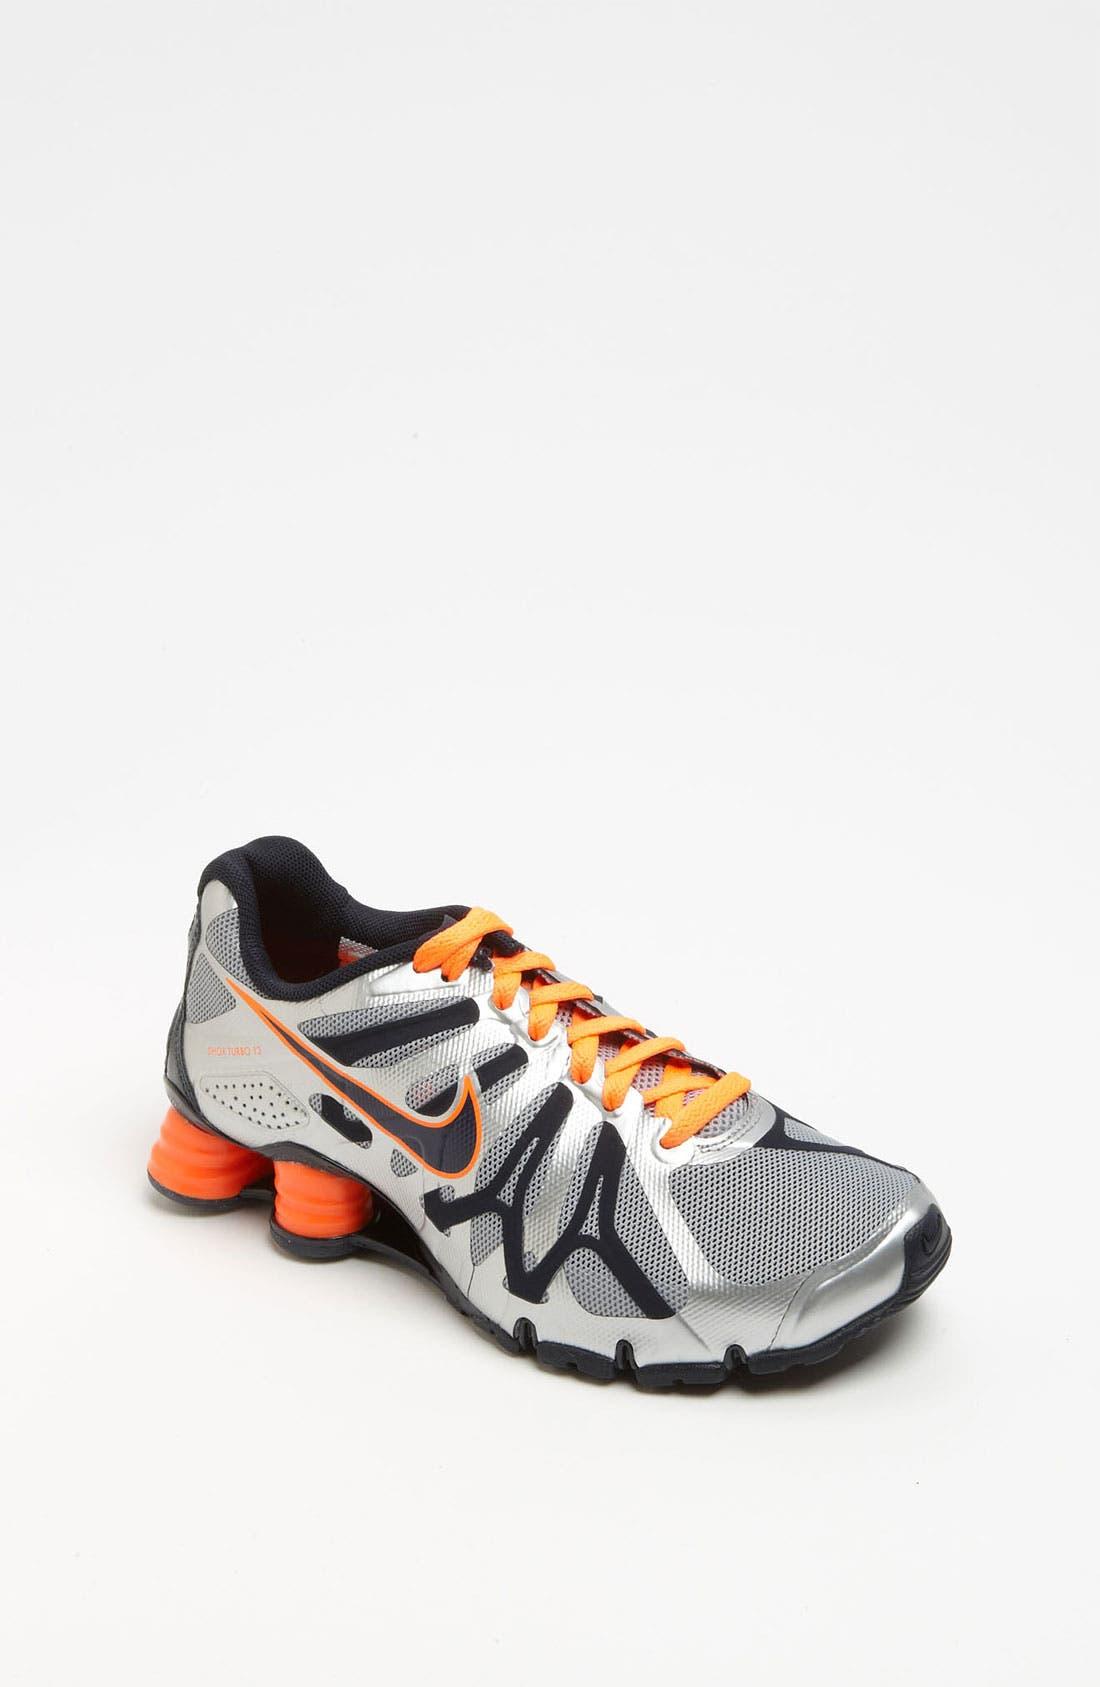 Alternate Image 1 Selected - Nike 'Shox Turbo 13' Running Shoe (Big Kid)